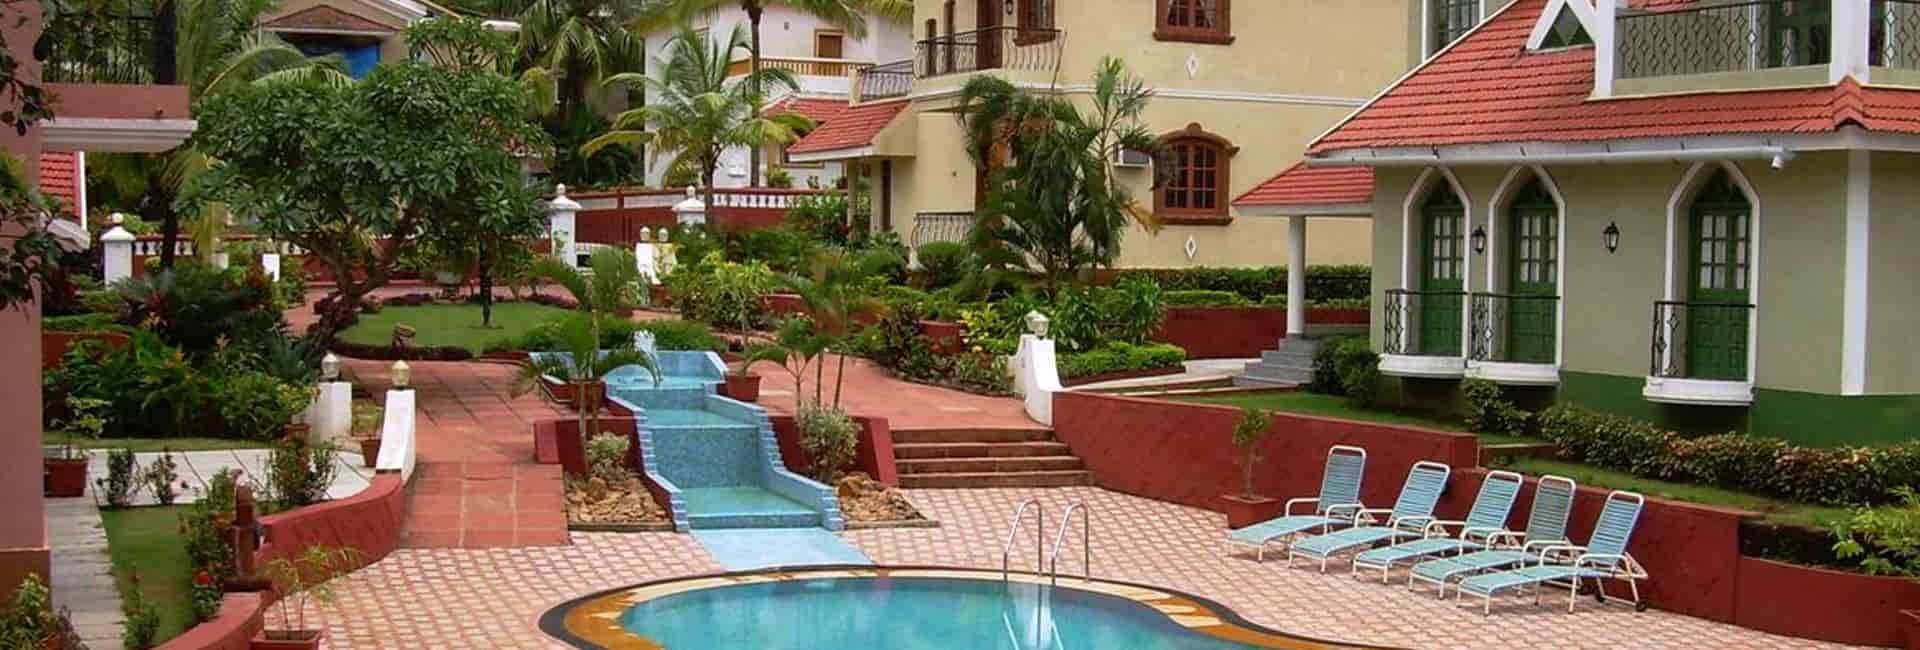 Villas In Goa 199 Best Villas In Goa For Holidays